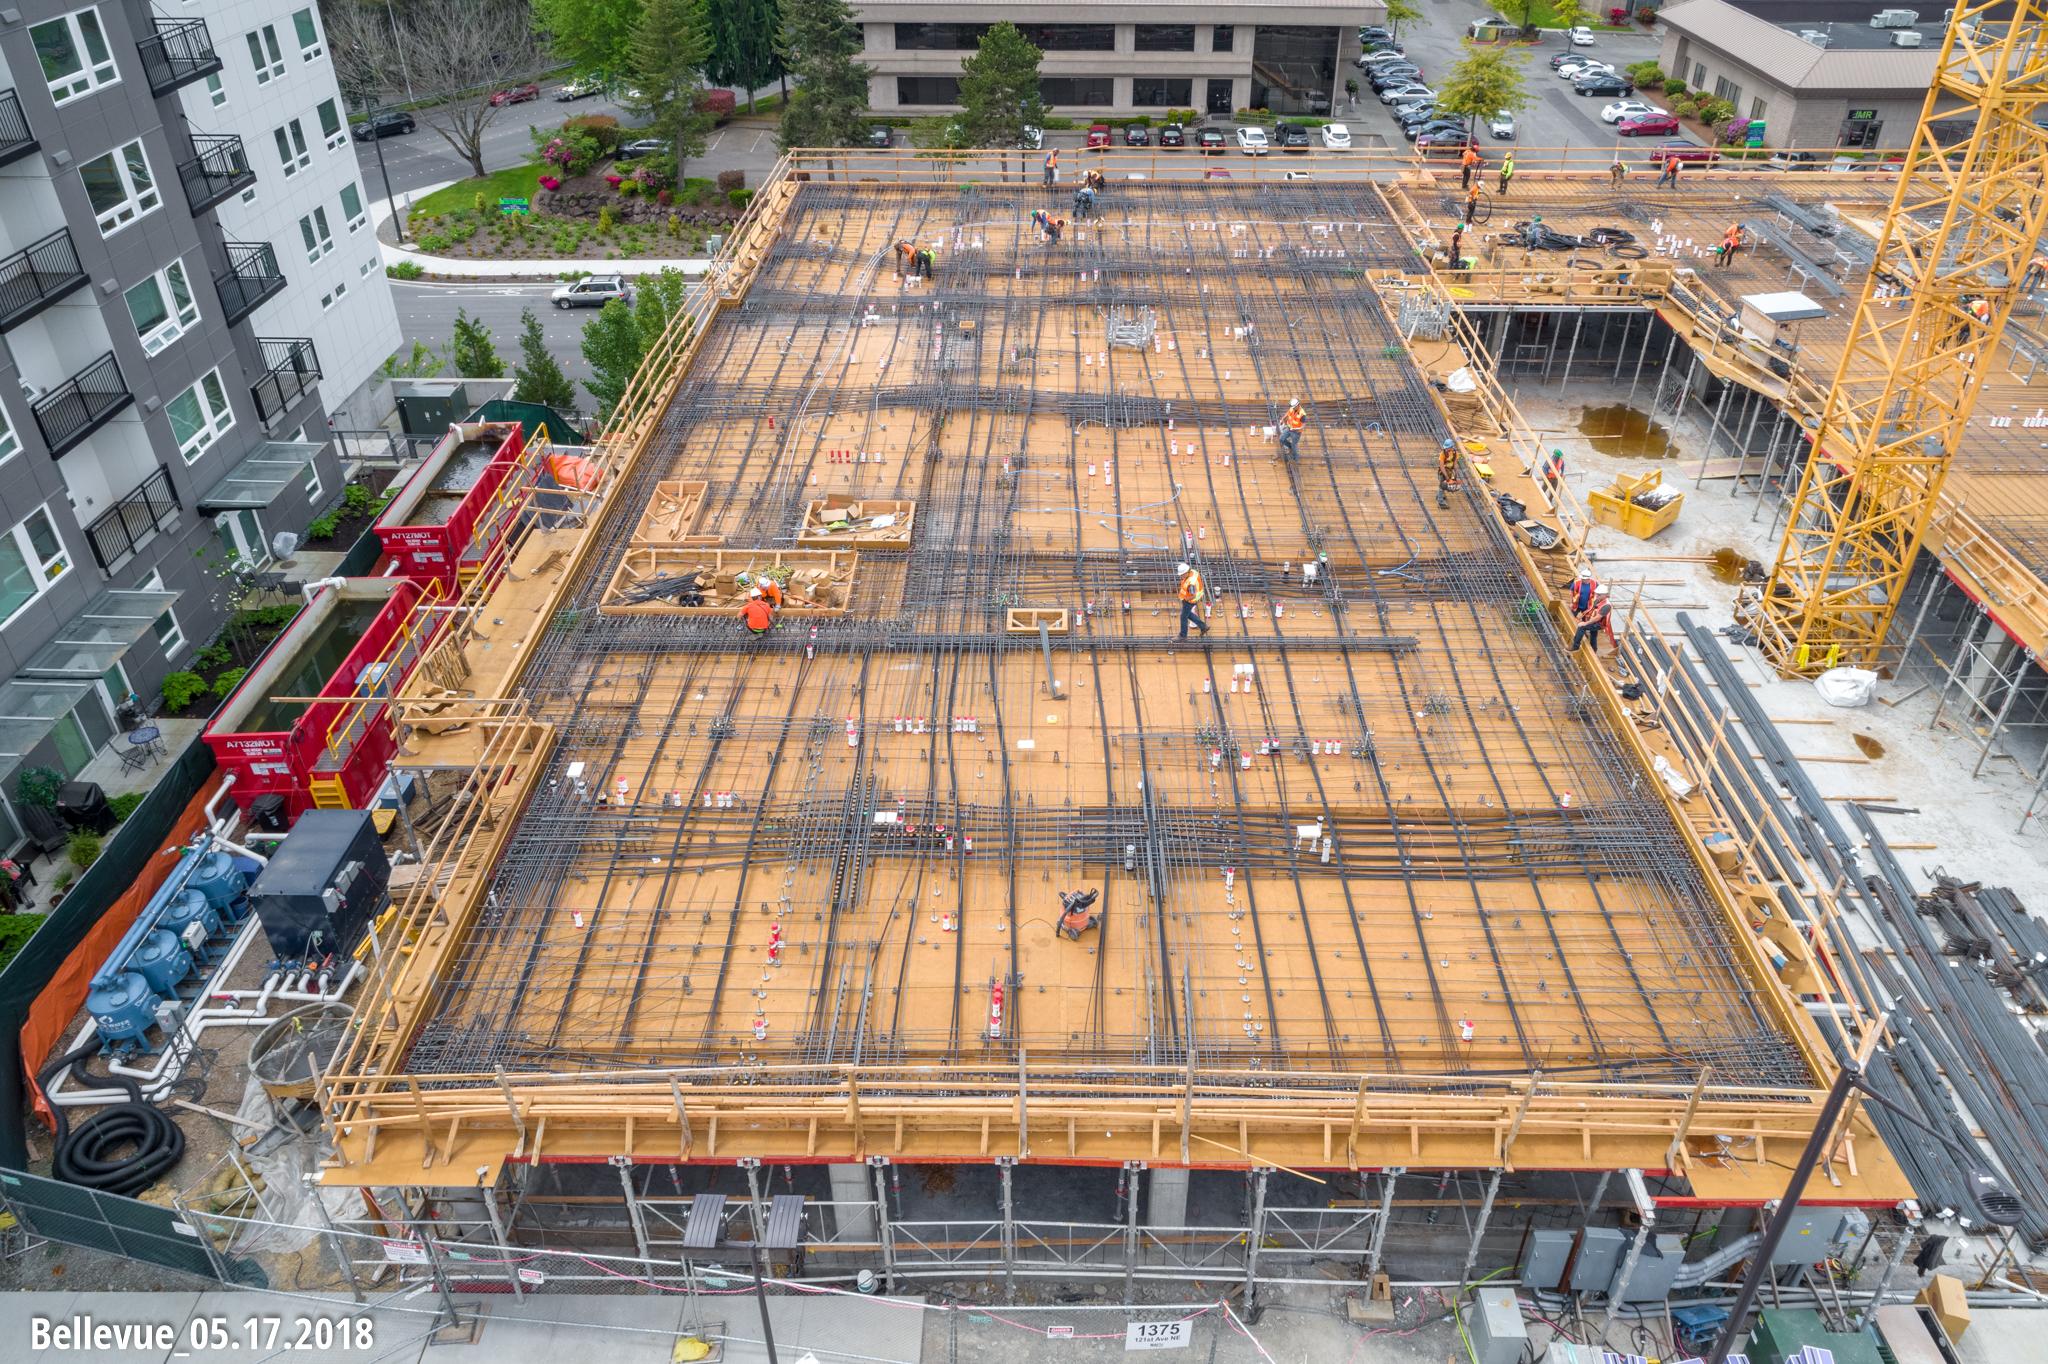 Kyle Ventle_NorthWest Drone Works_Bellevue WA Construction Aerial Photography-6.jpg